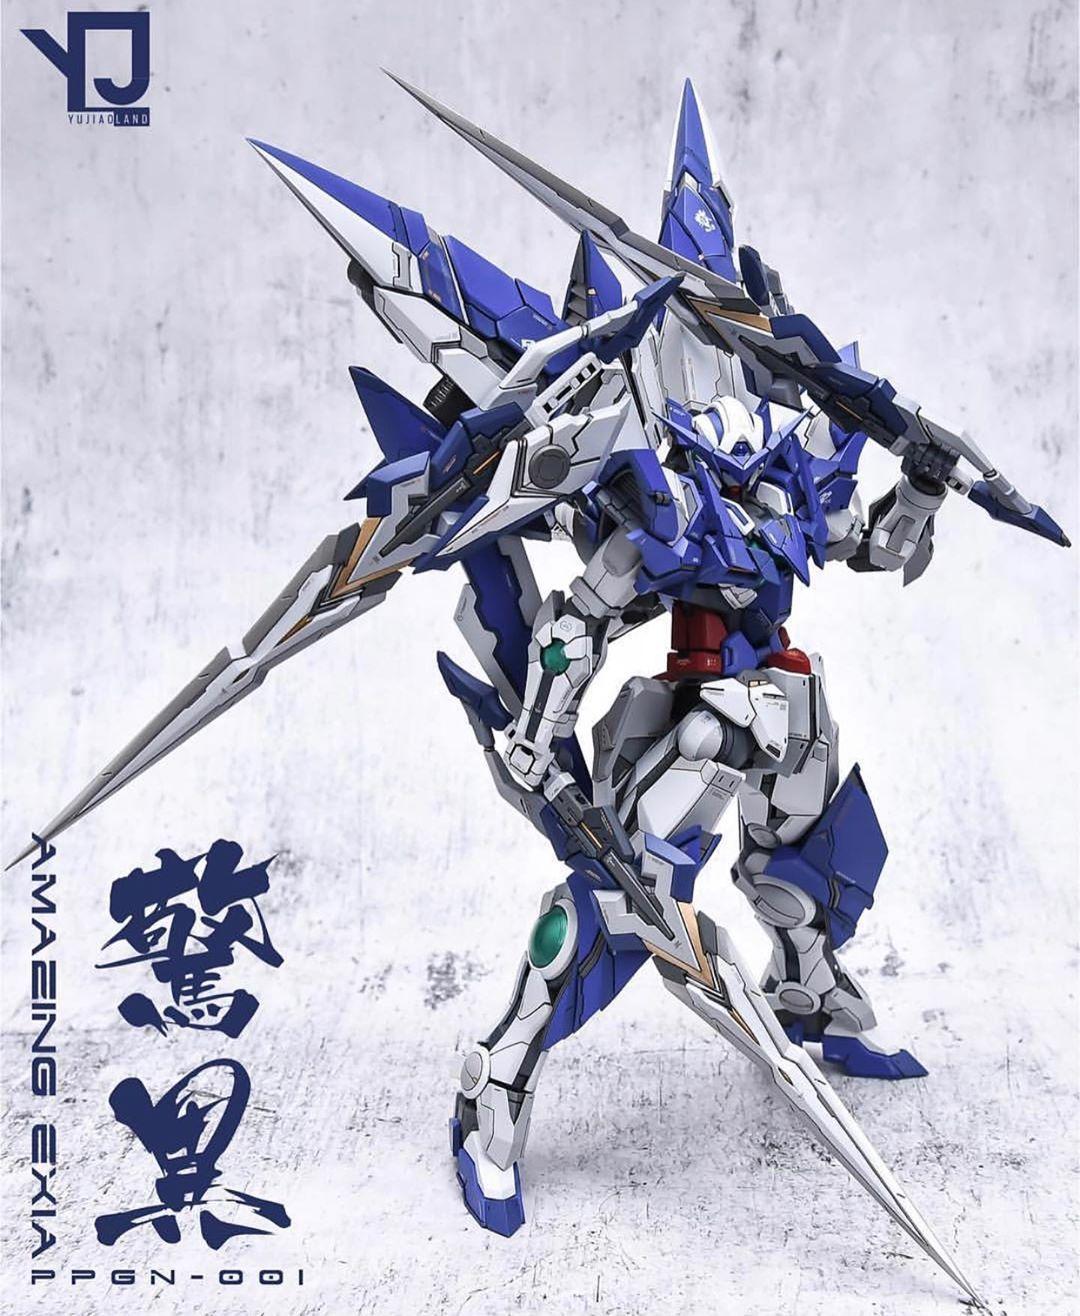 Pin on Gundams